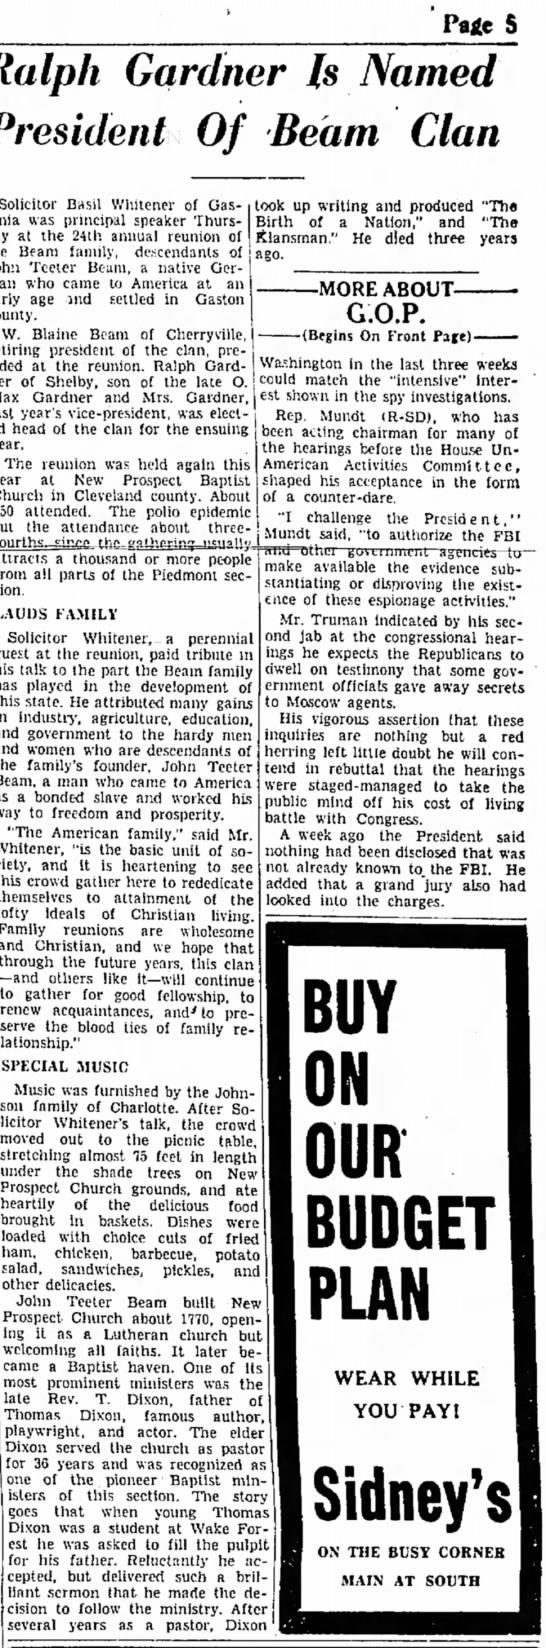 Beam Clan ReunionGalstonia Gazette, N.C. 8-13-1948, p. 5